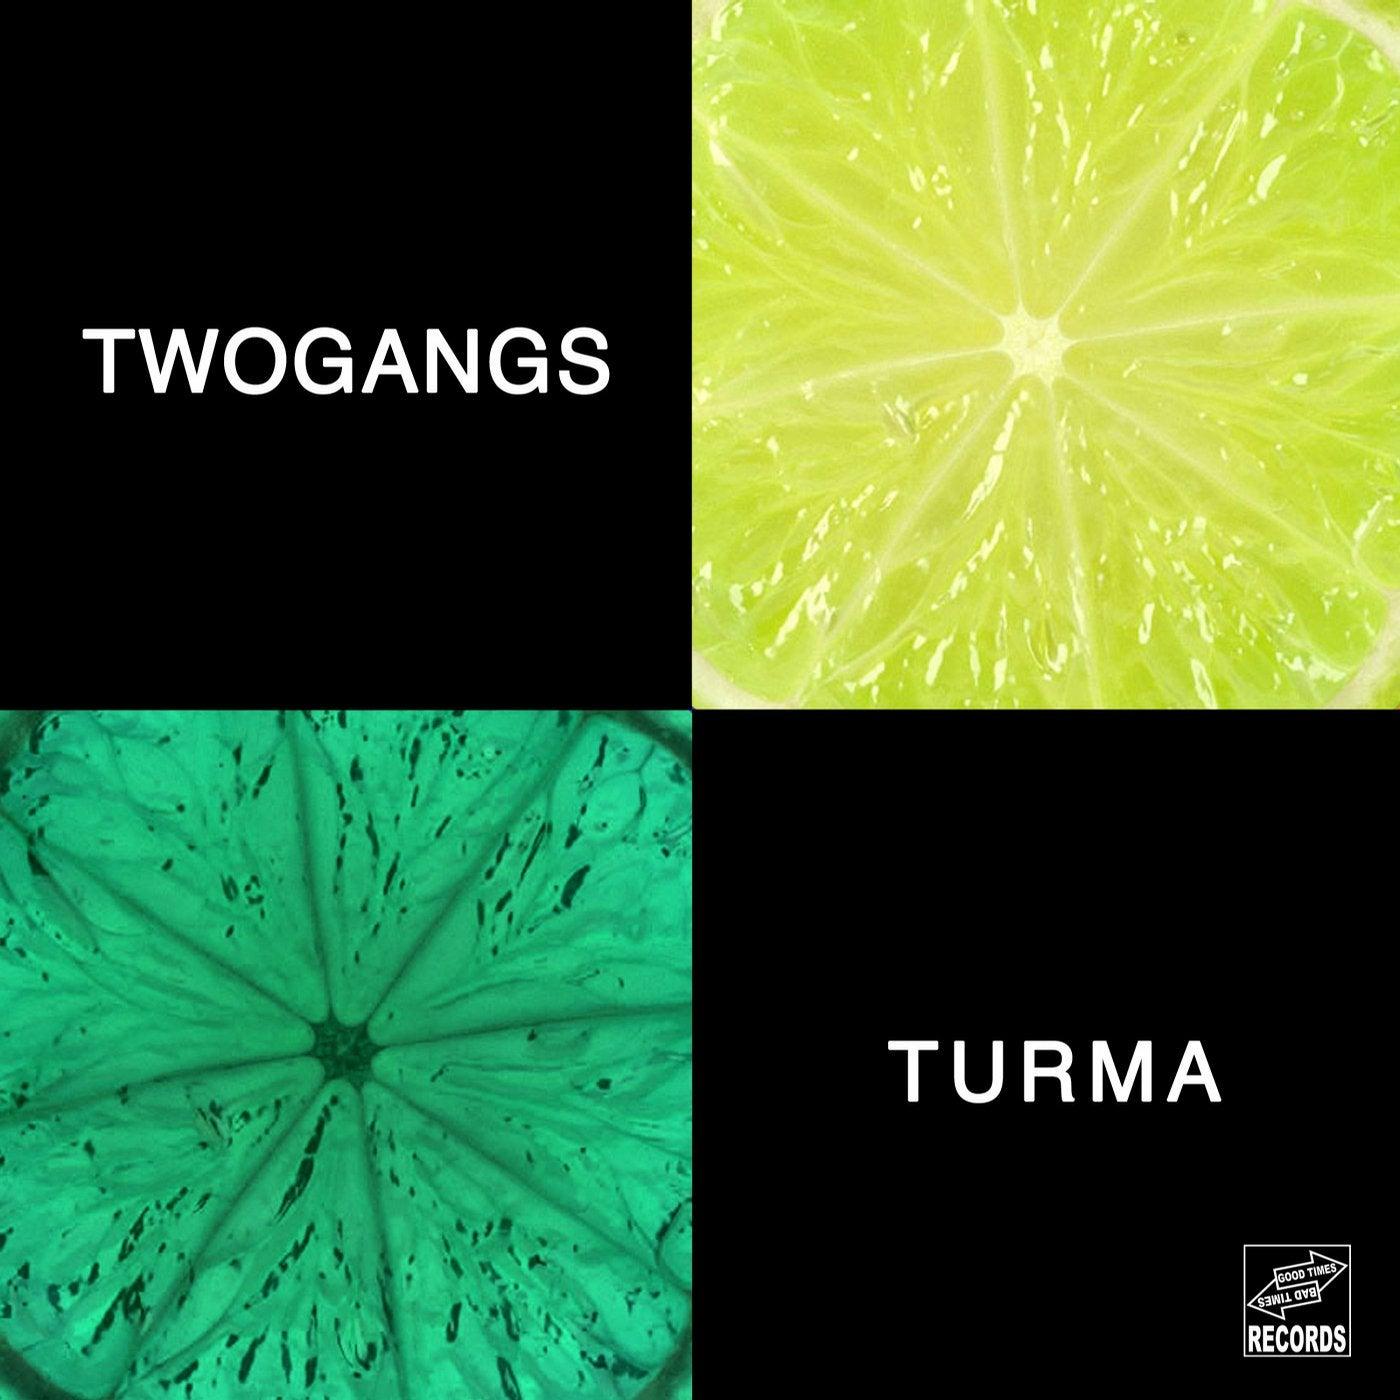 TURMA (Original Mix)